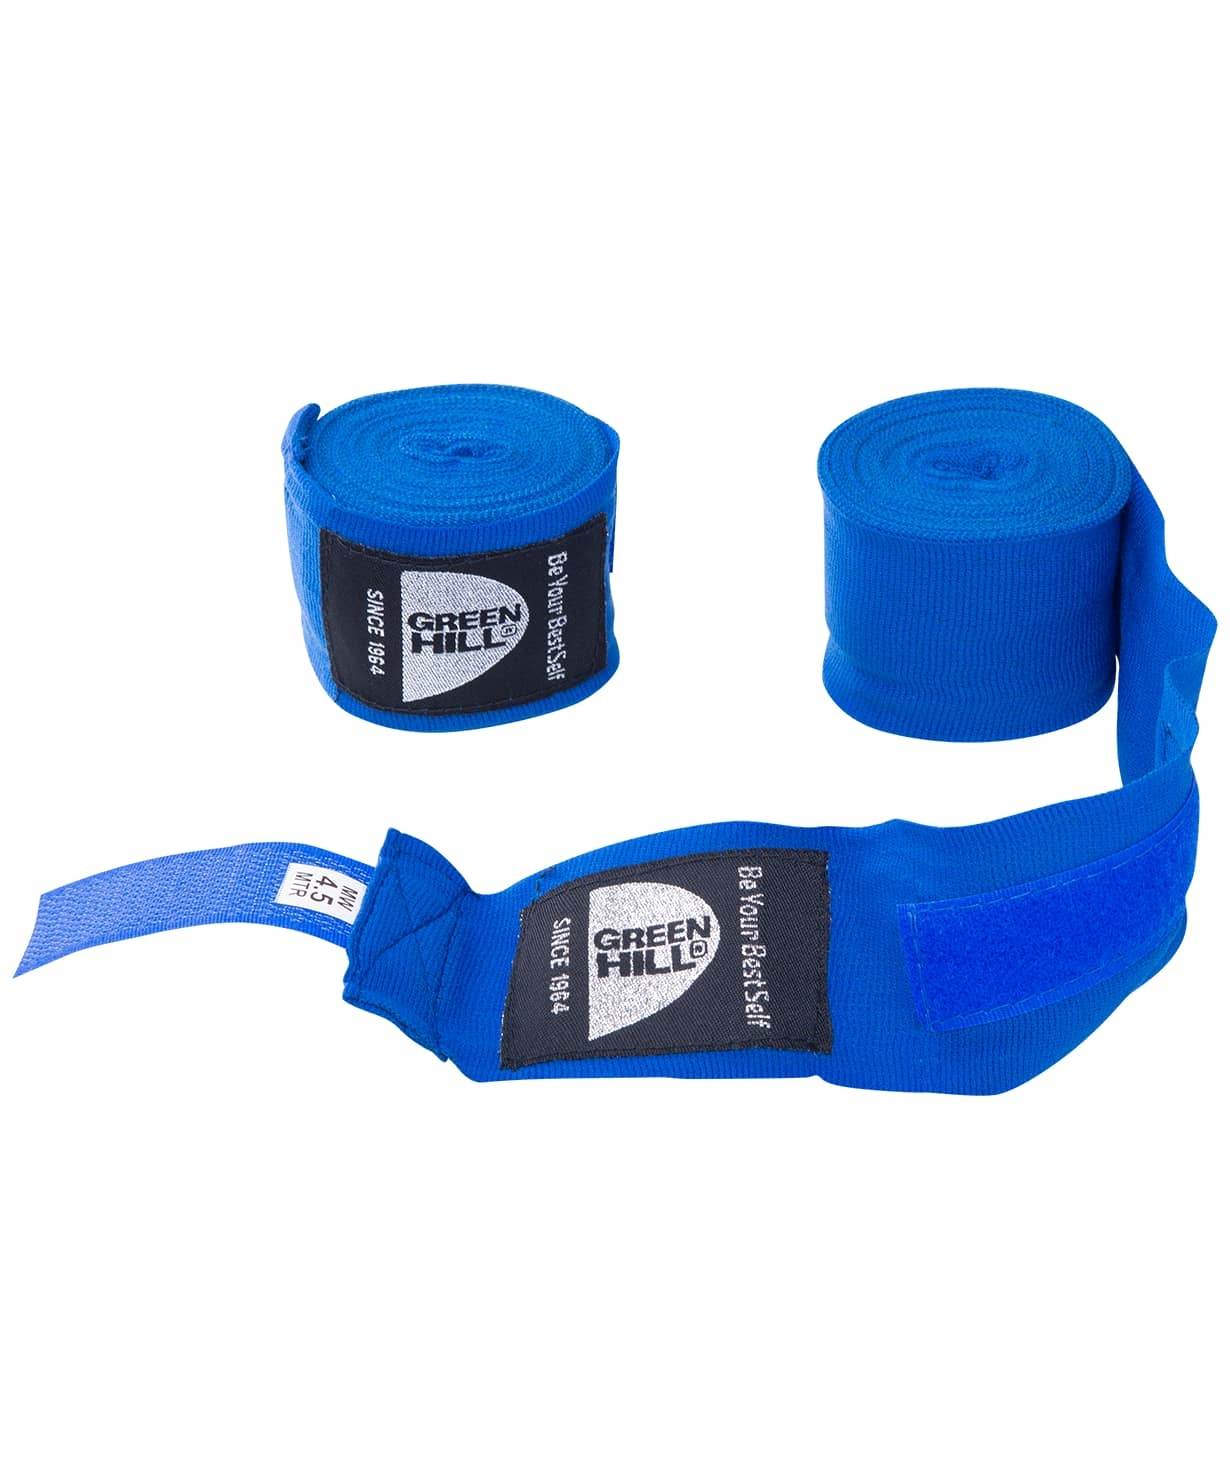 Бинт боксерский BP-6232d, 4,5м, эластик, синий